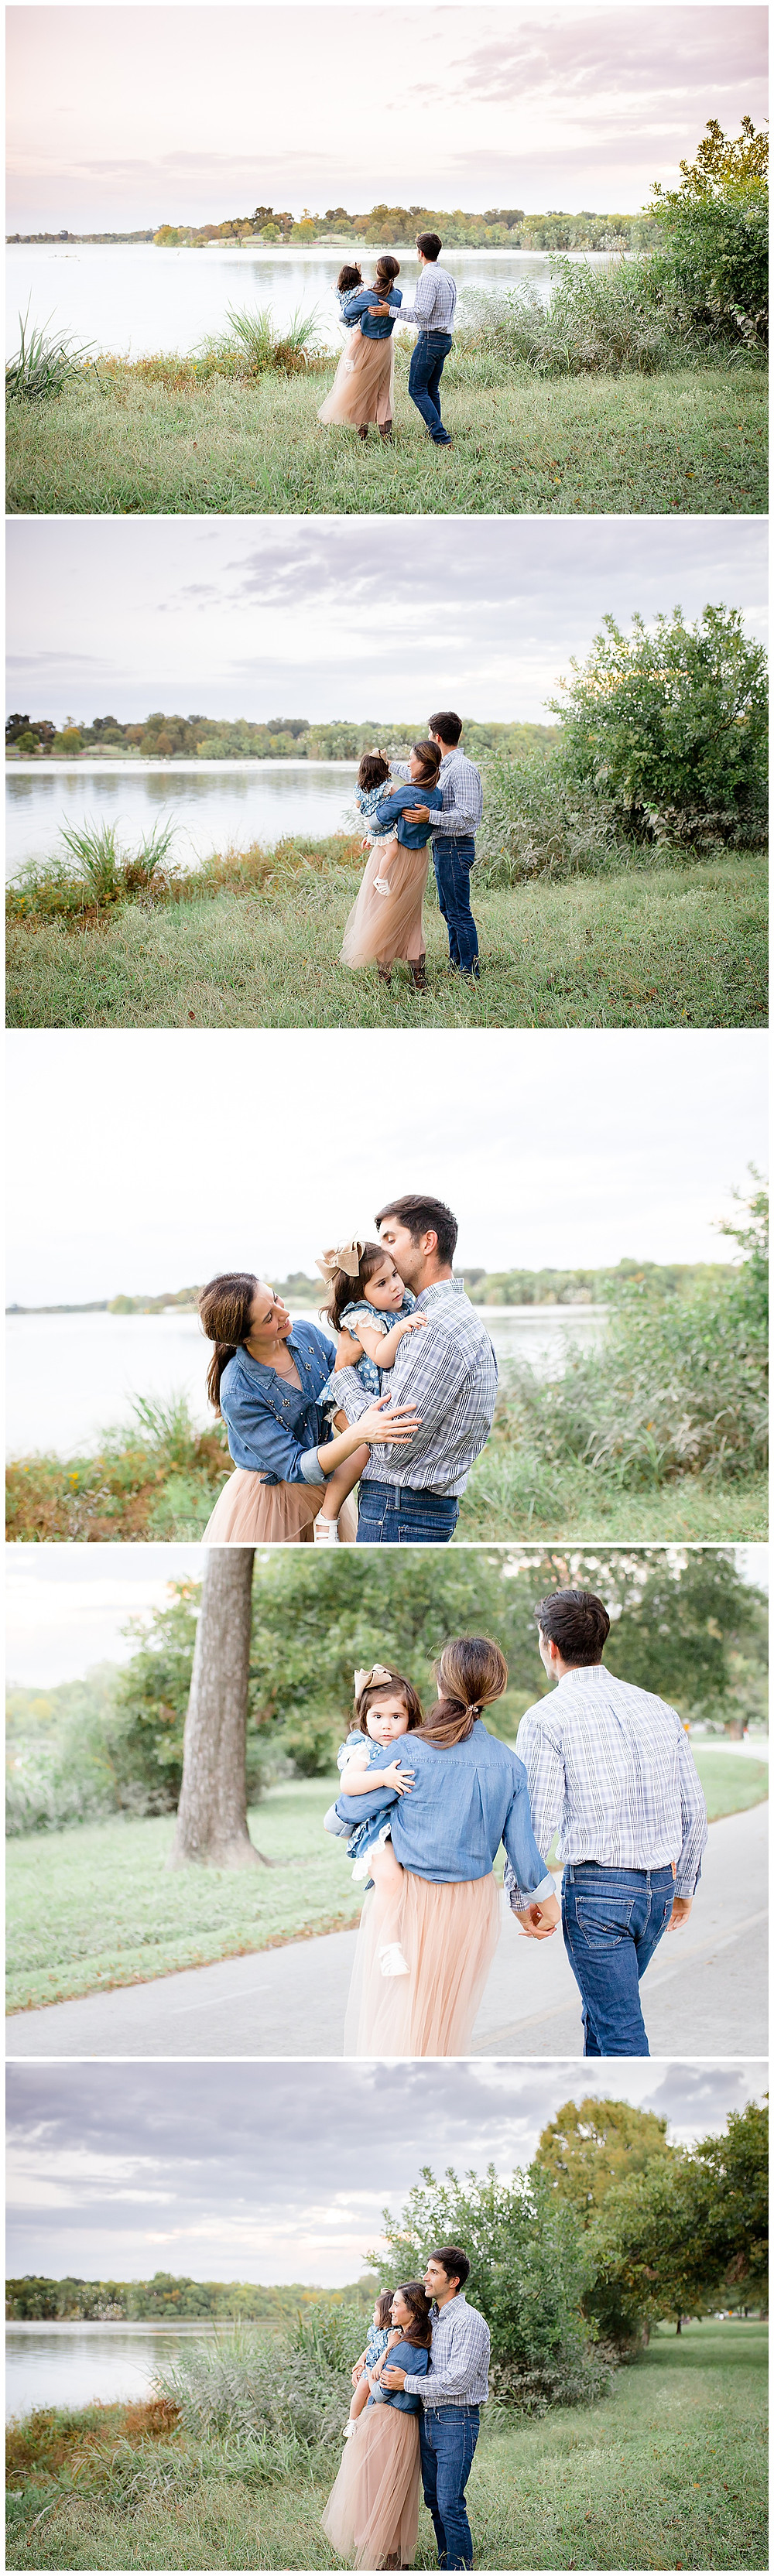 family photographer in Dallas, TX